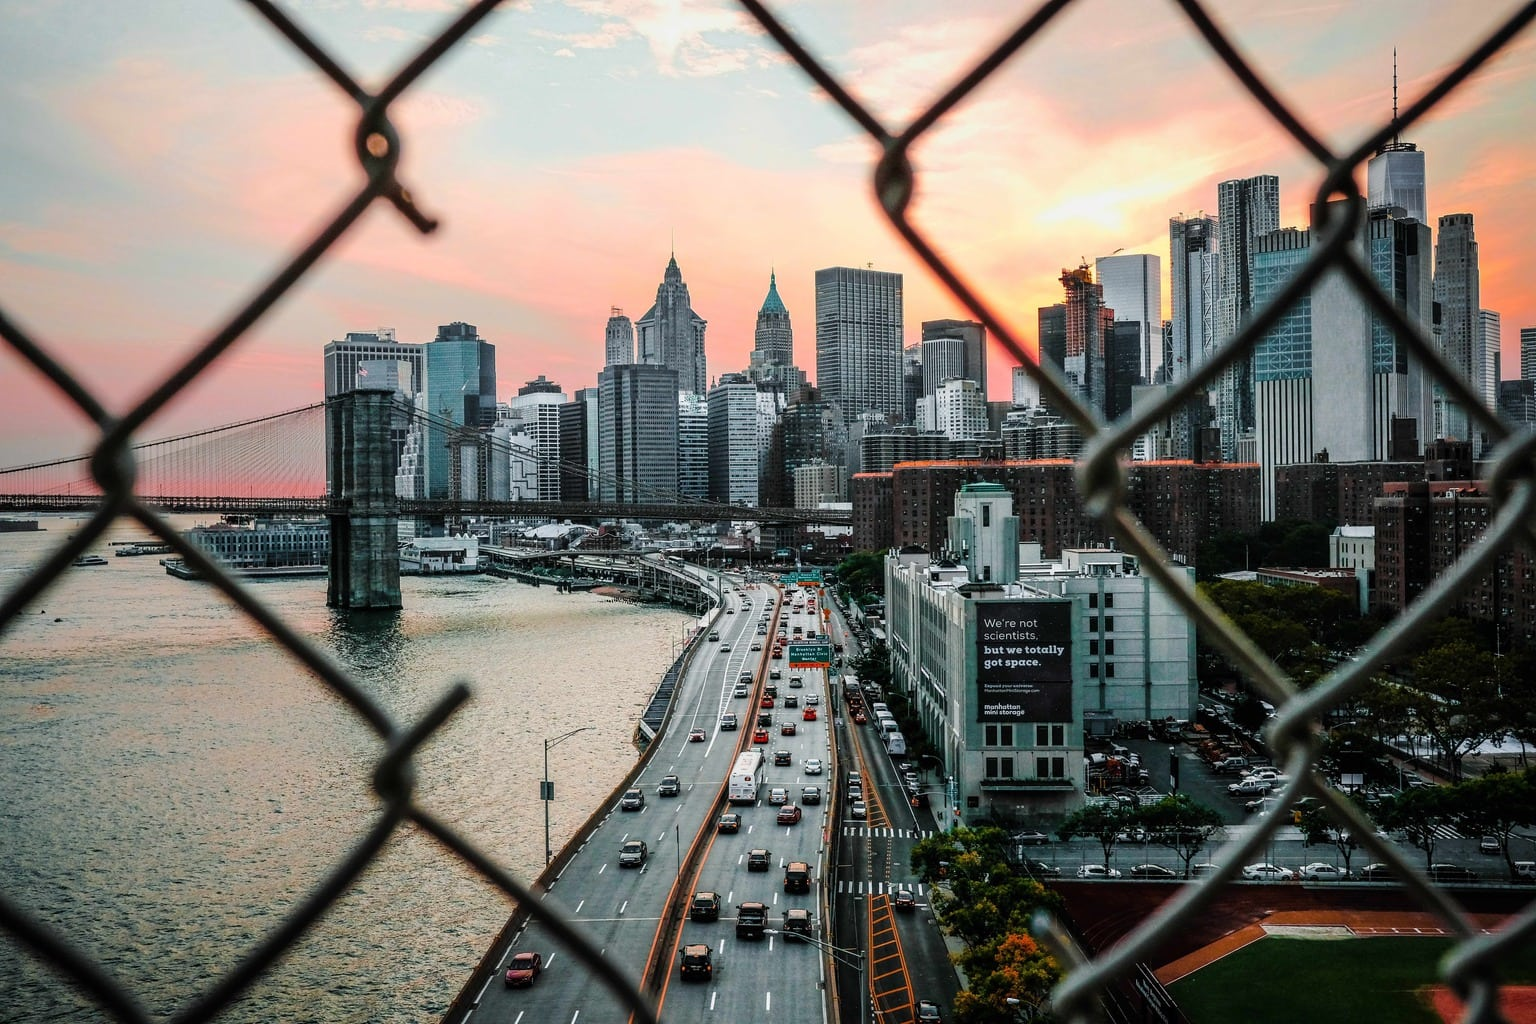 Fotografía urbana al atardecer